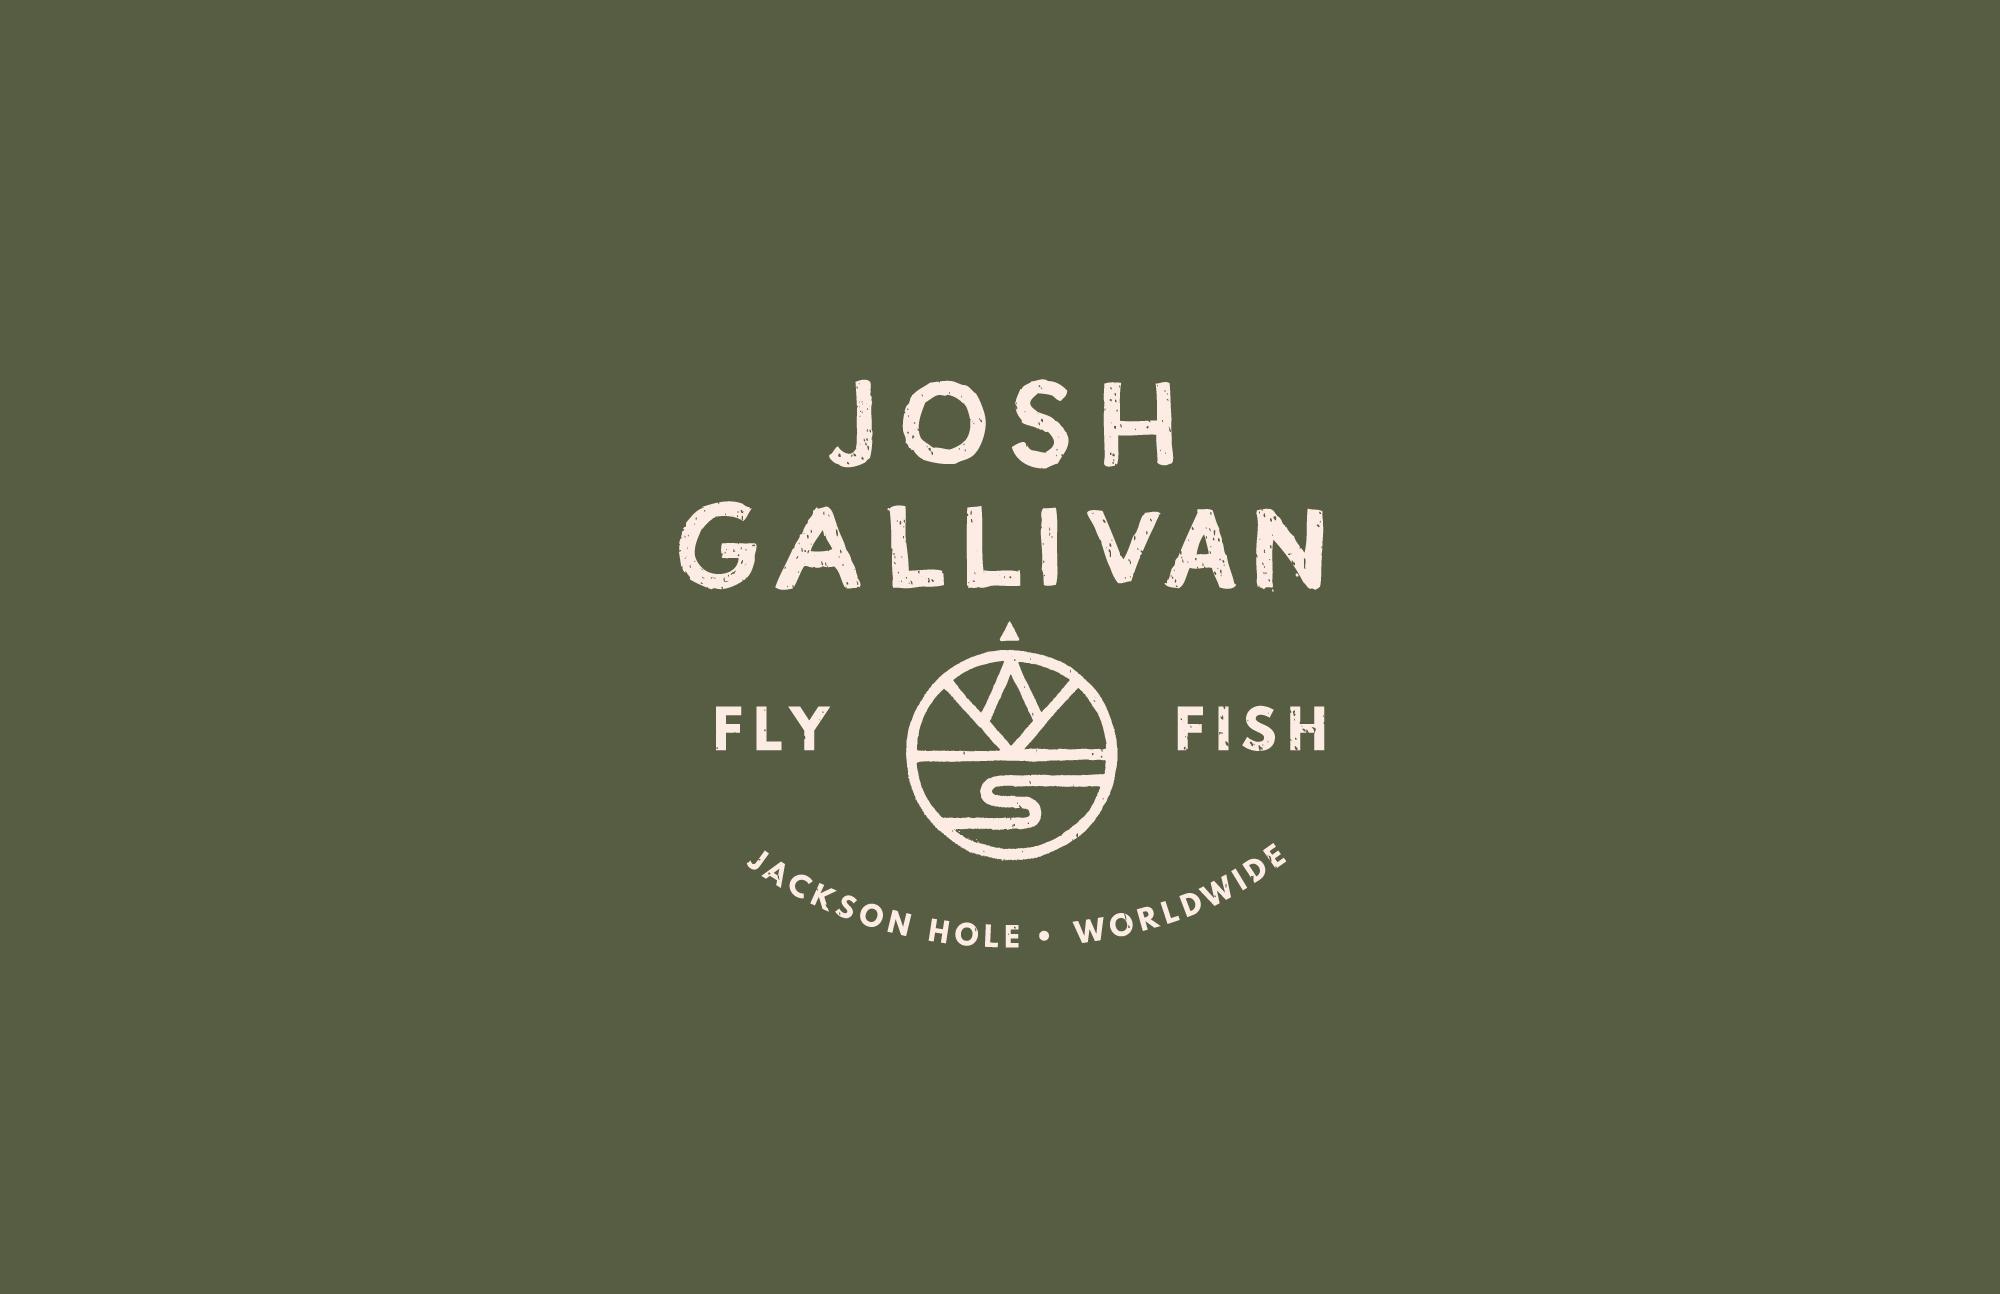 viscayawagner_select_josh-gallivan_01.jpg